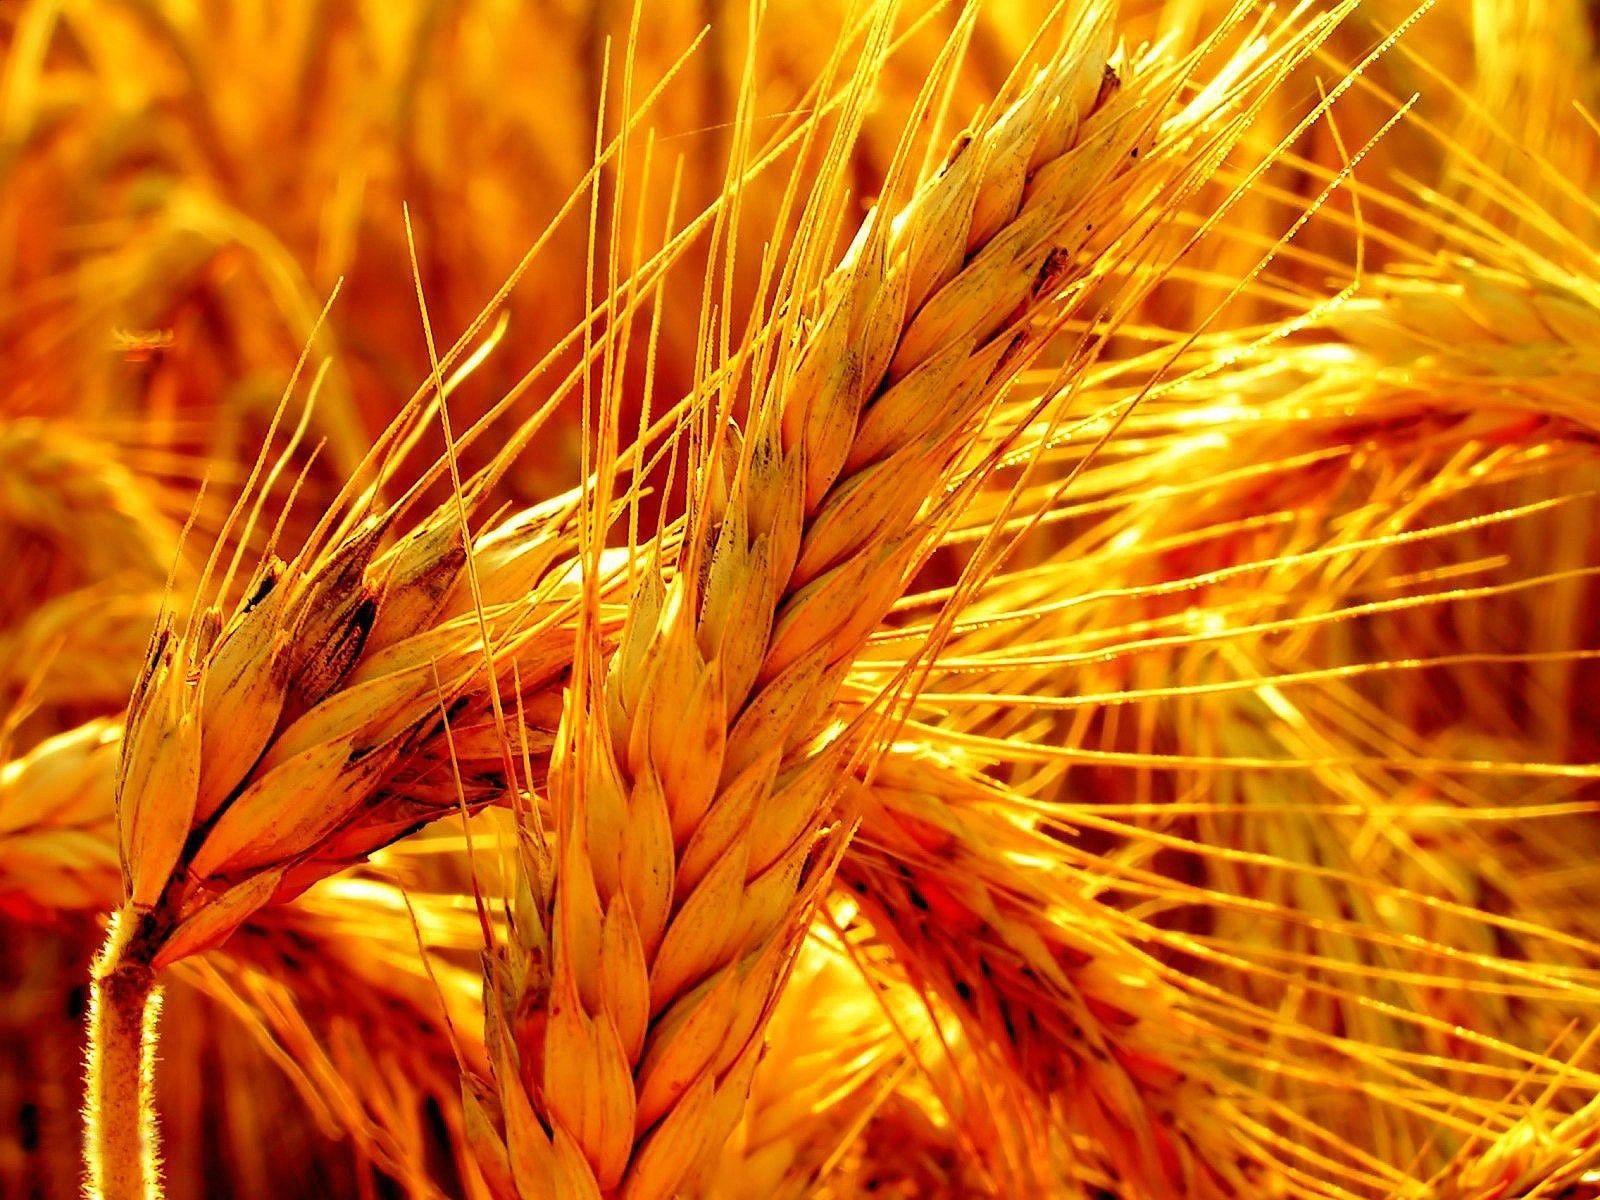 orange oats grain color photography Orange